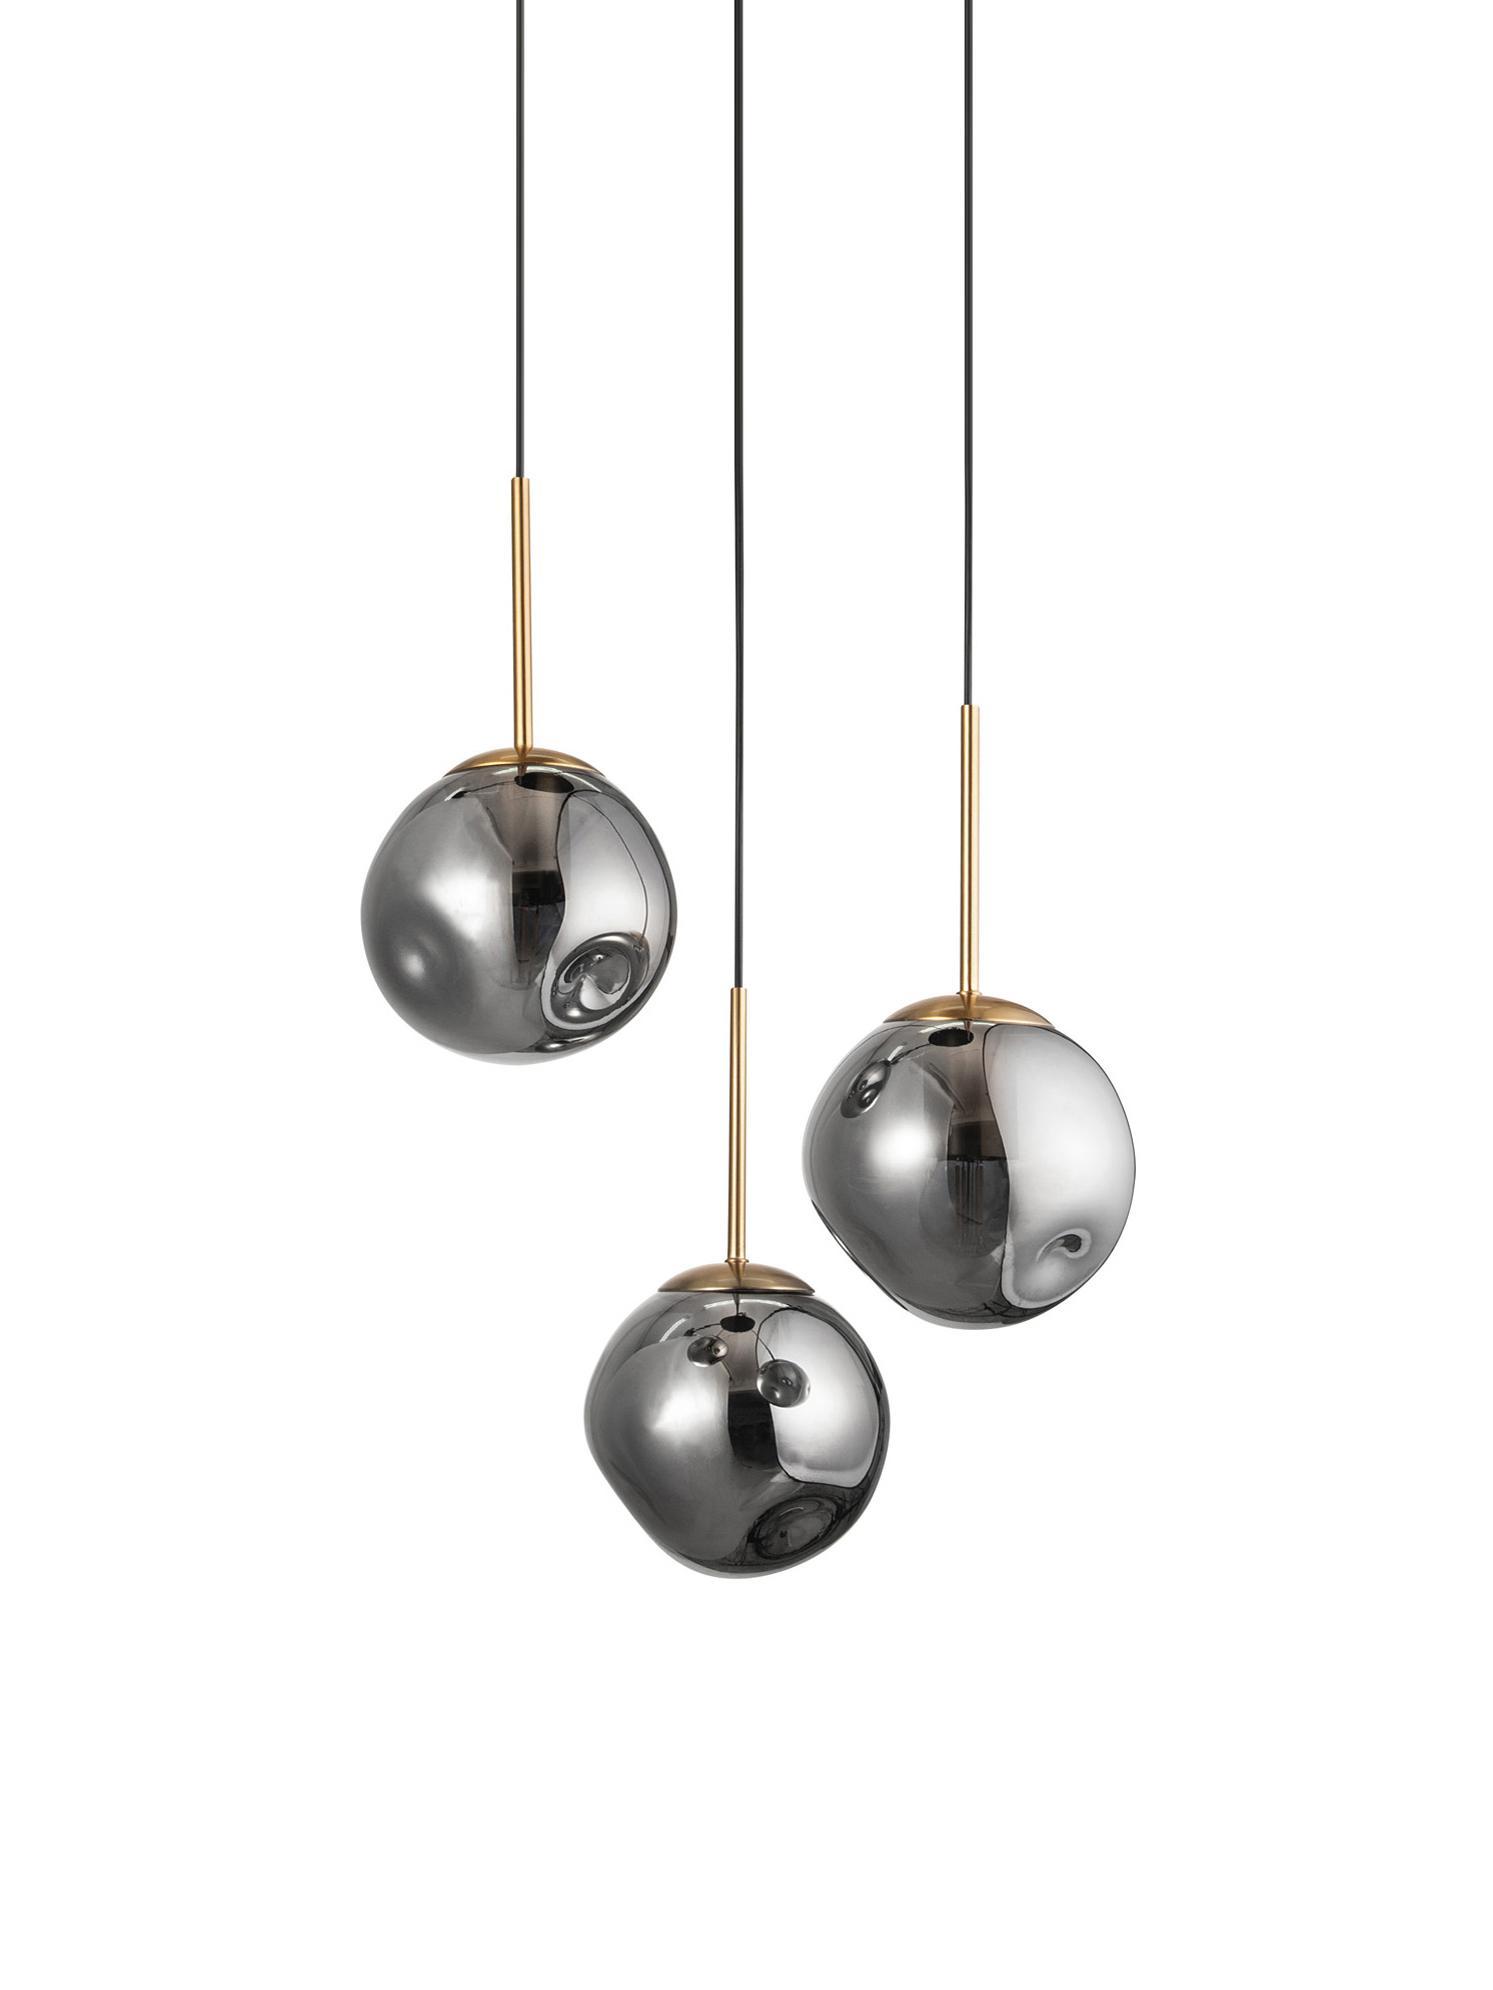 Pendelleuchte Spada aus Glas, Lampenschirm: Glas, Baldachin: Kunststoff, Messingfarben, Grau, Ø 40 x H 28 cm